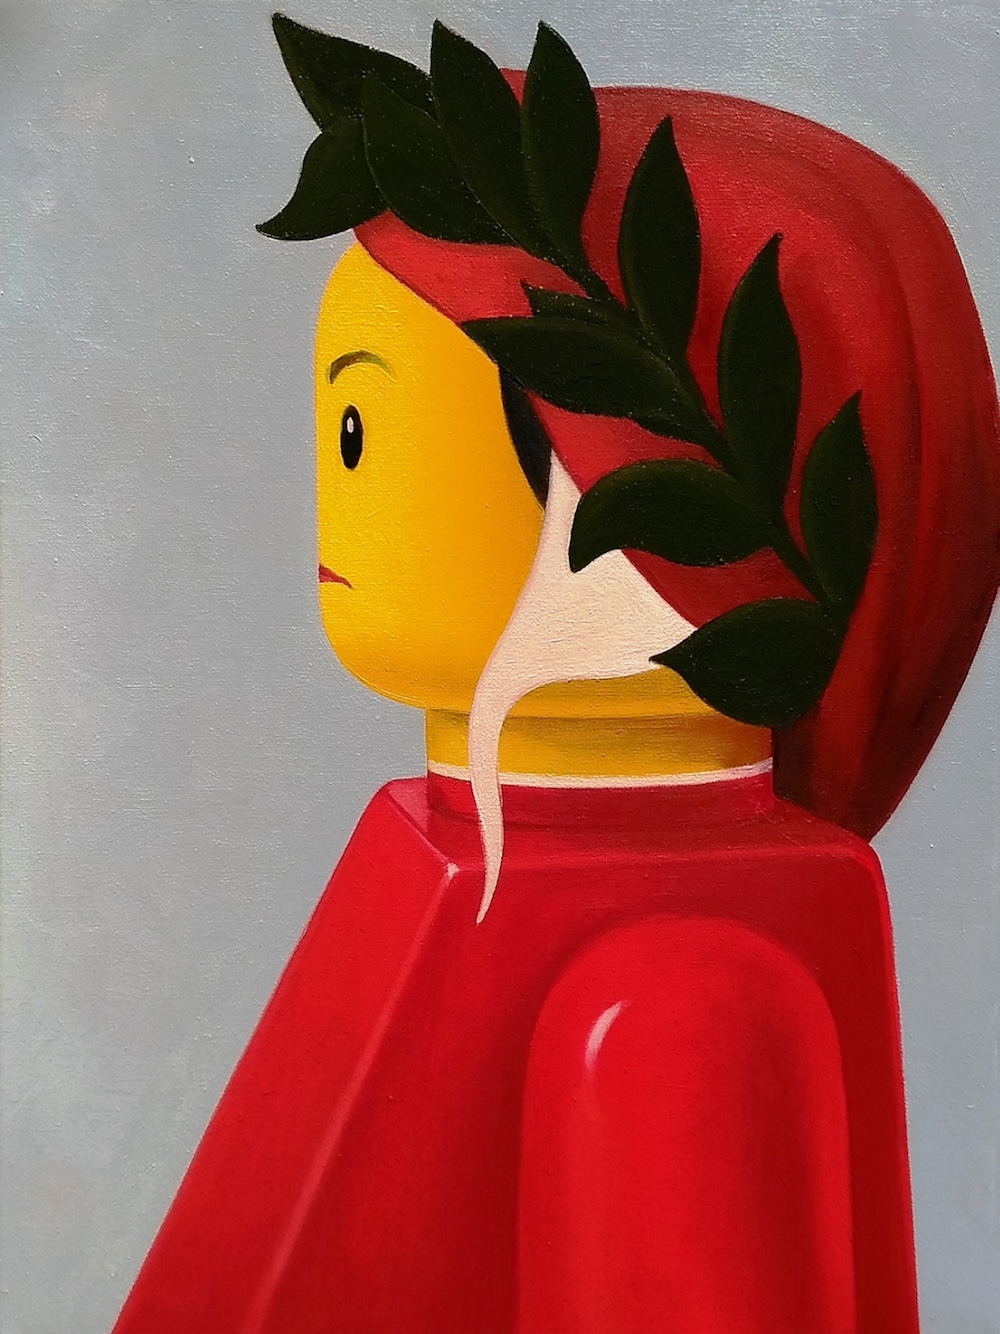 LEGO art painting stefano bolcato botticelli dante